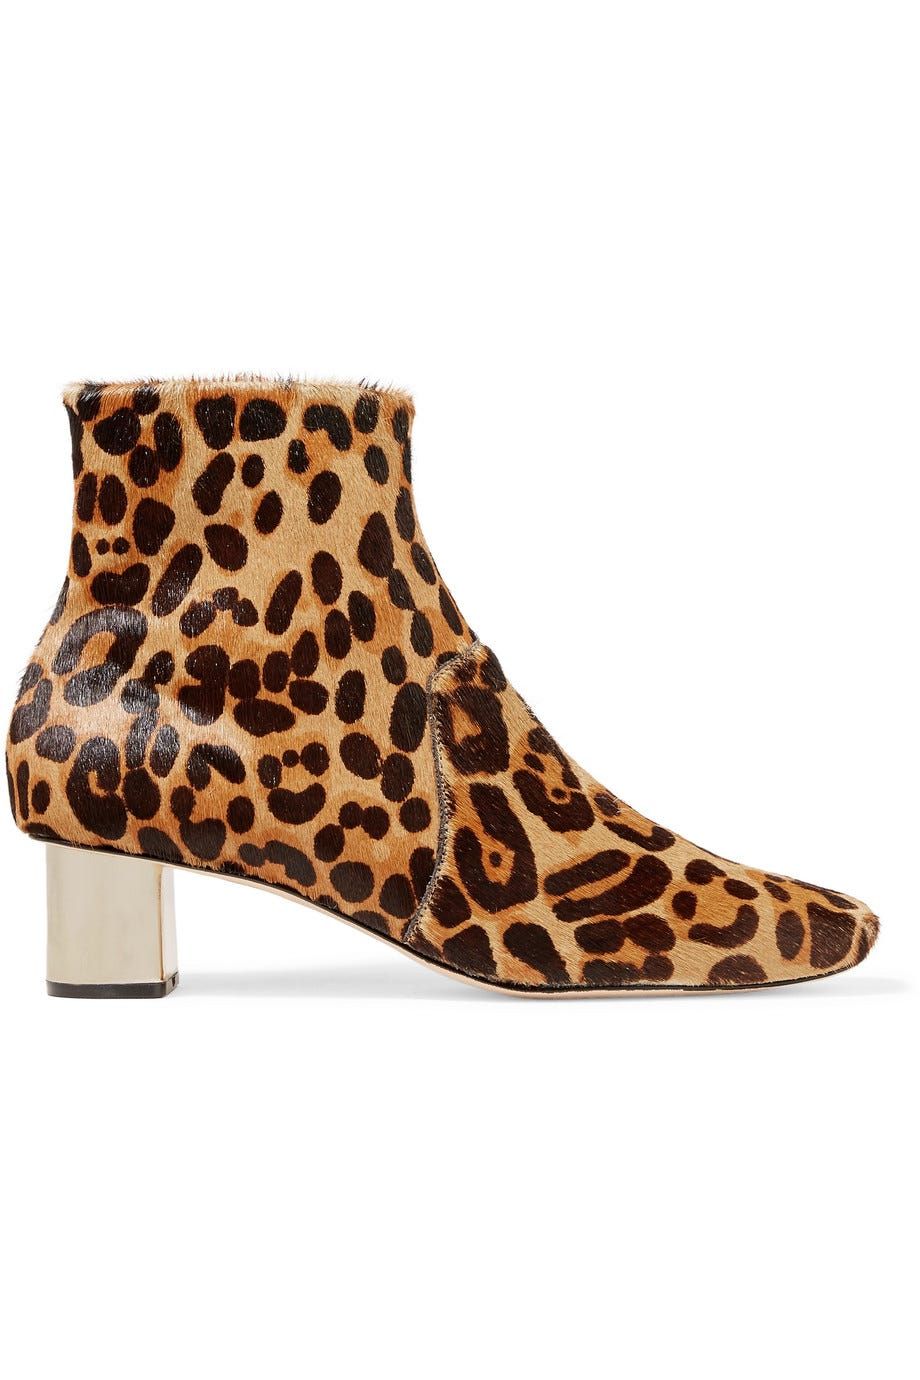 01fbe345f3a0 Nanushka. Clarence Leopard-print Calf Hair Ankle Boots